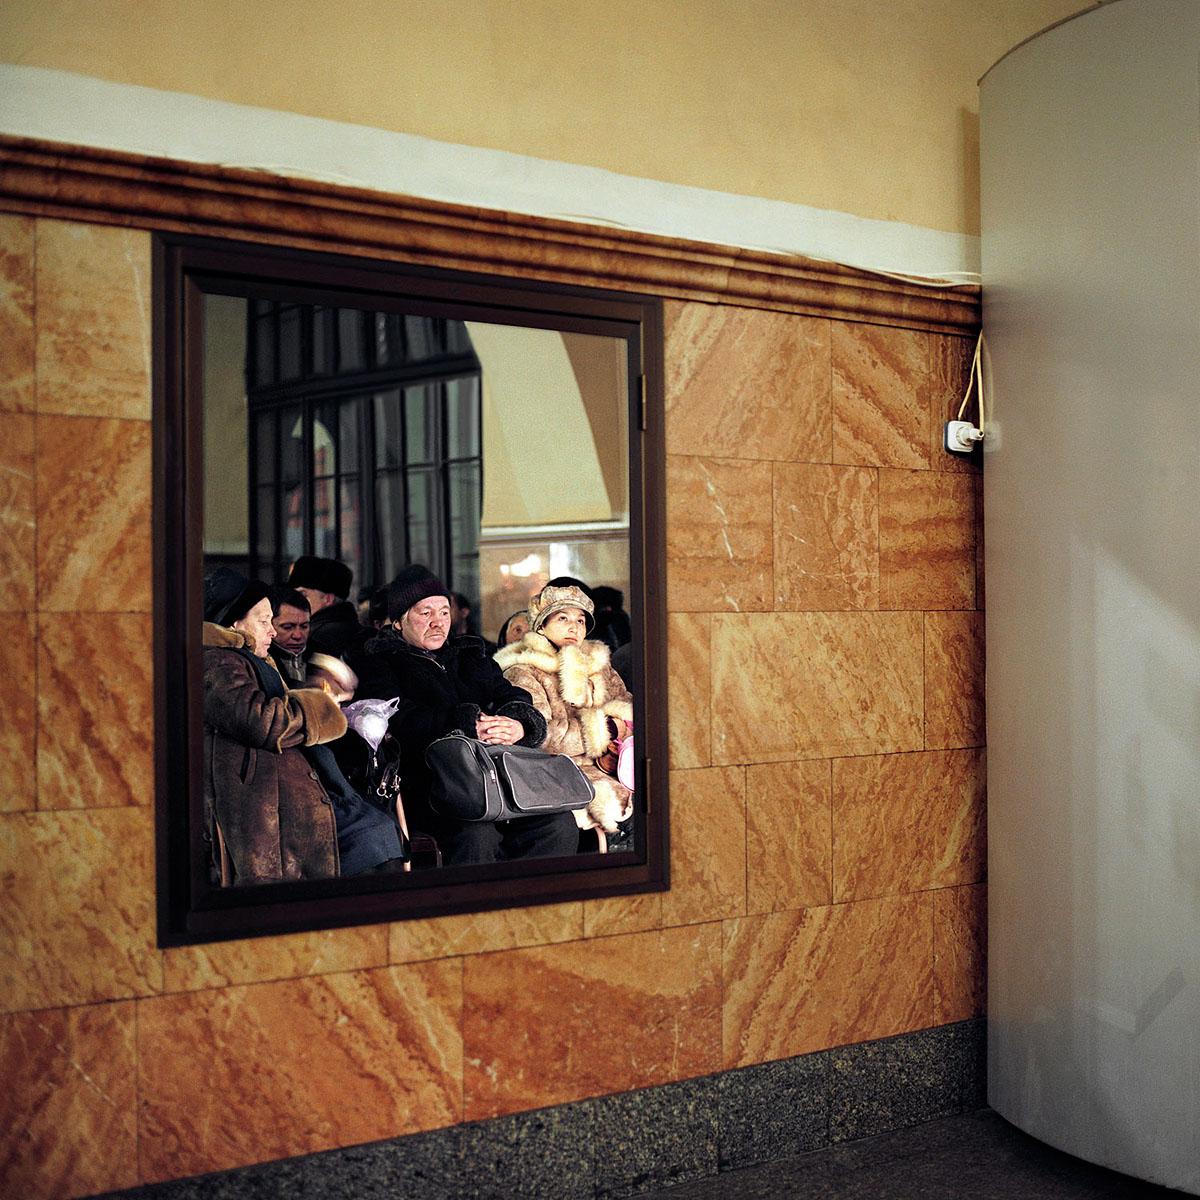 russian-fairy-tale-on-surreal-photos_4